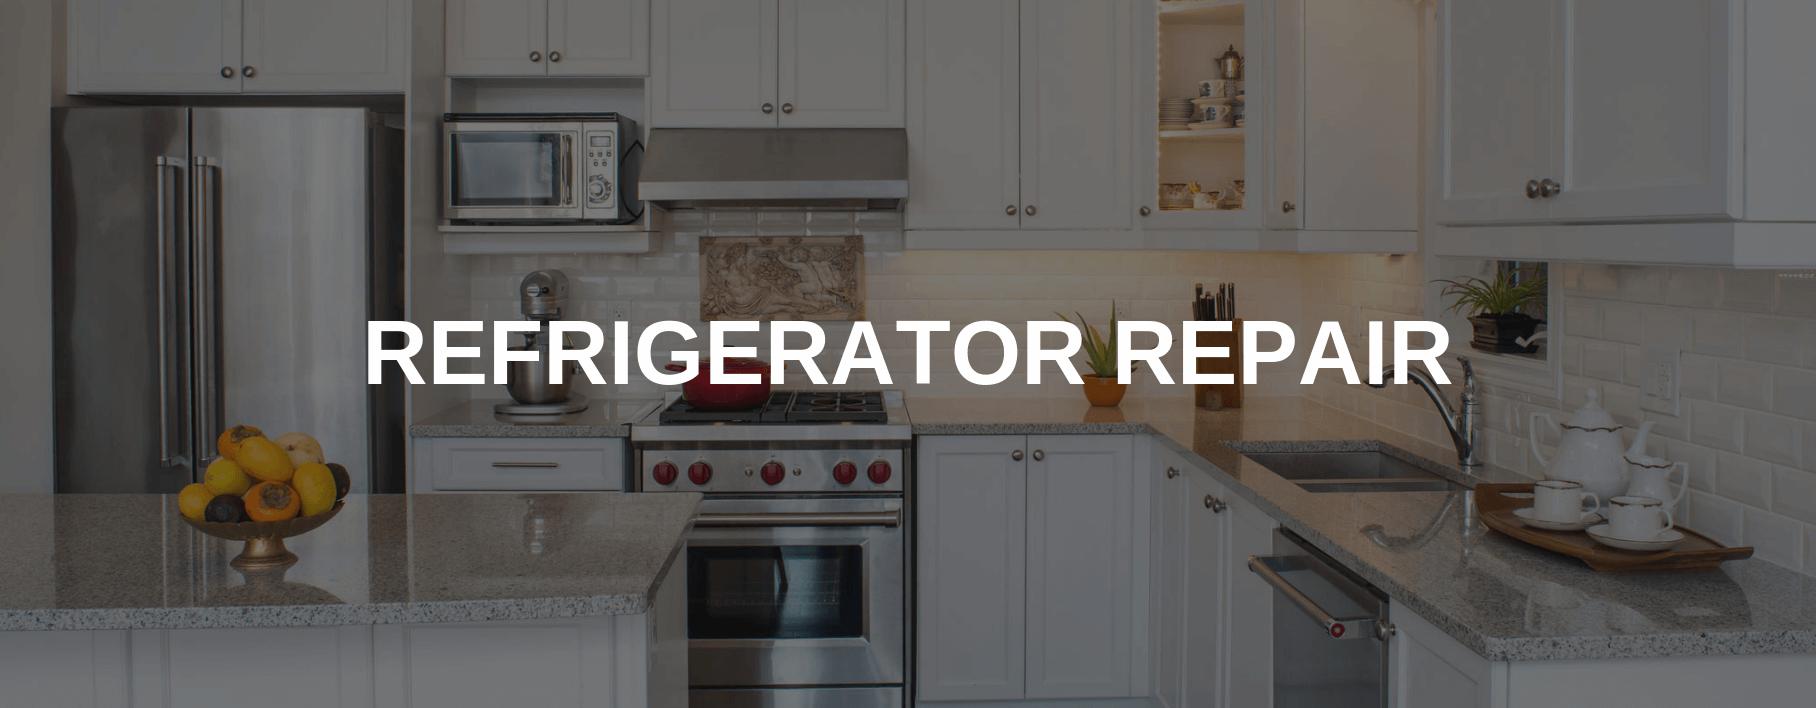 quincy refrigerator repair